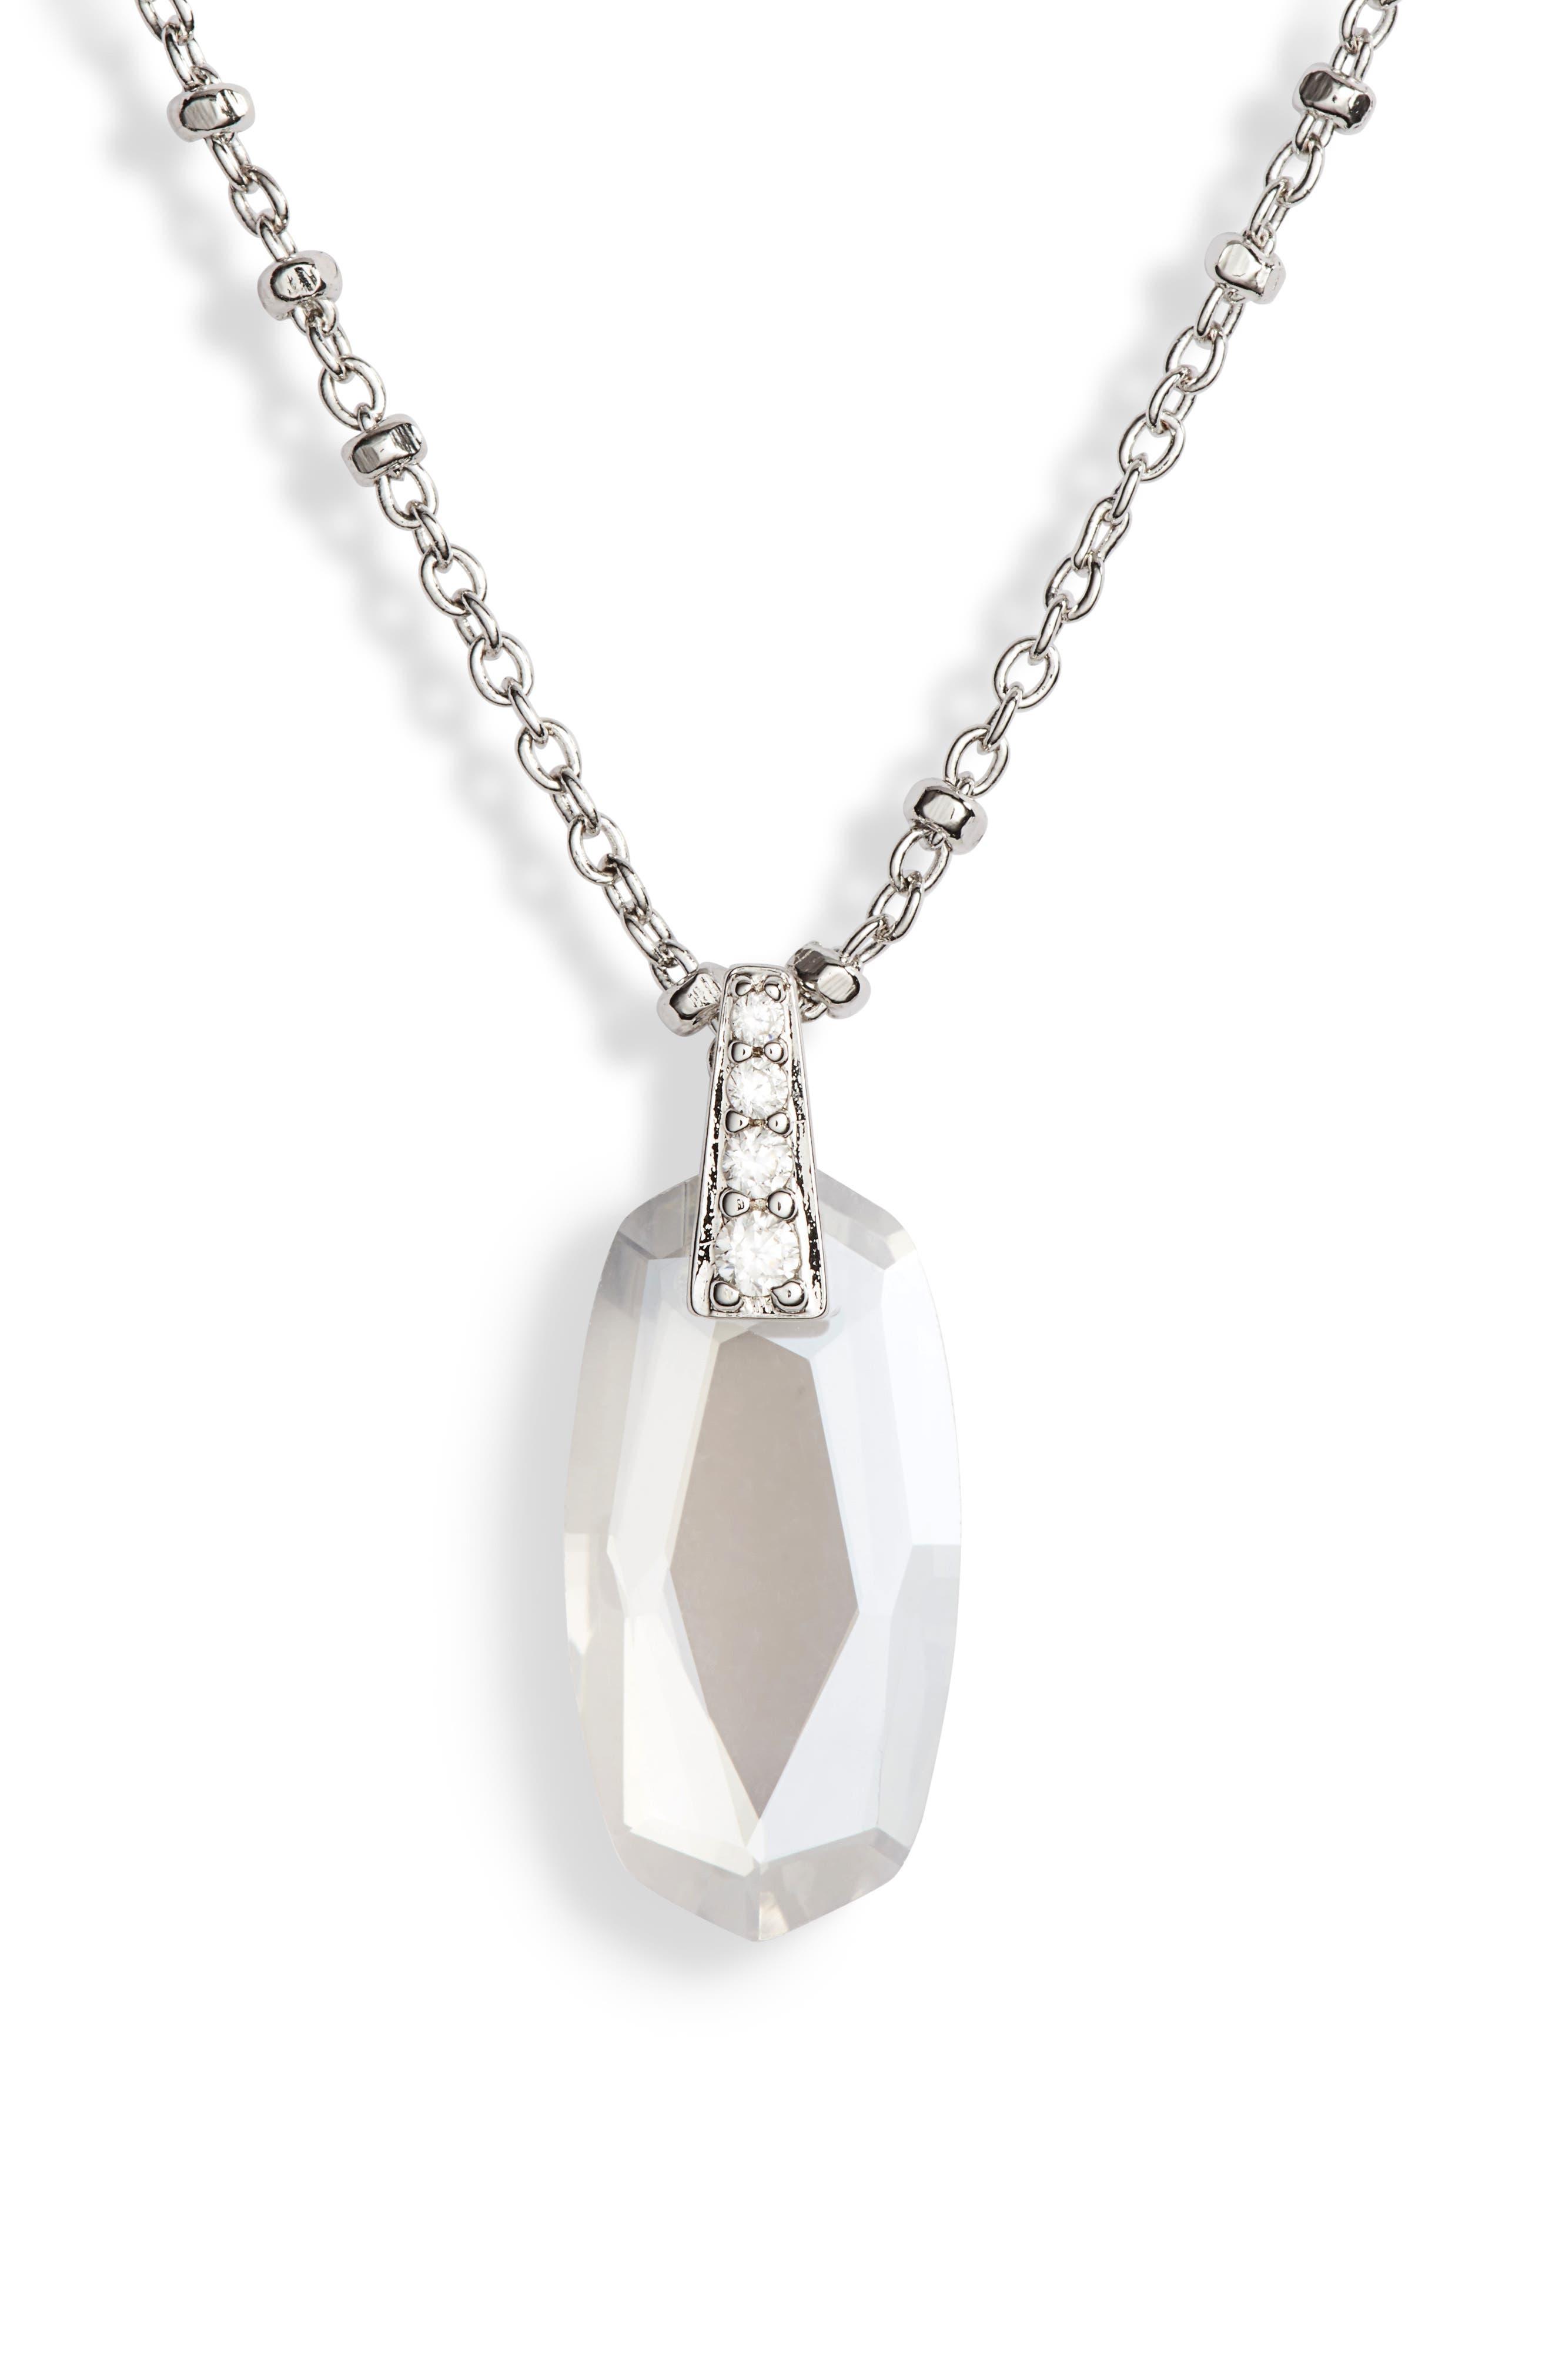 KENDRA SCOTT Camila Pendant Necklace, Main, color, LUSTRE GLASSS/ SILVER